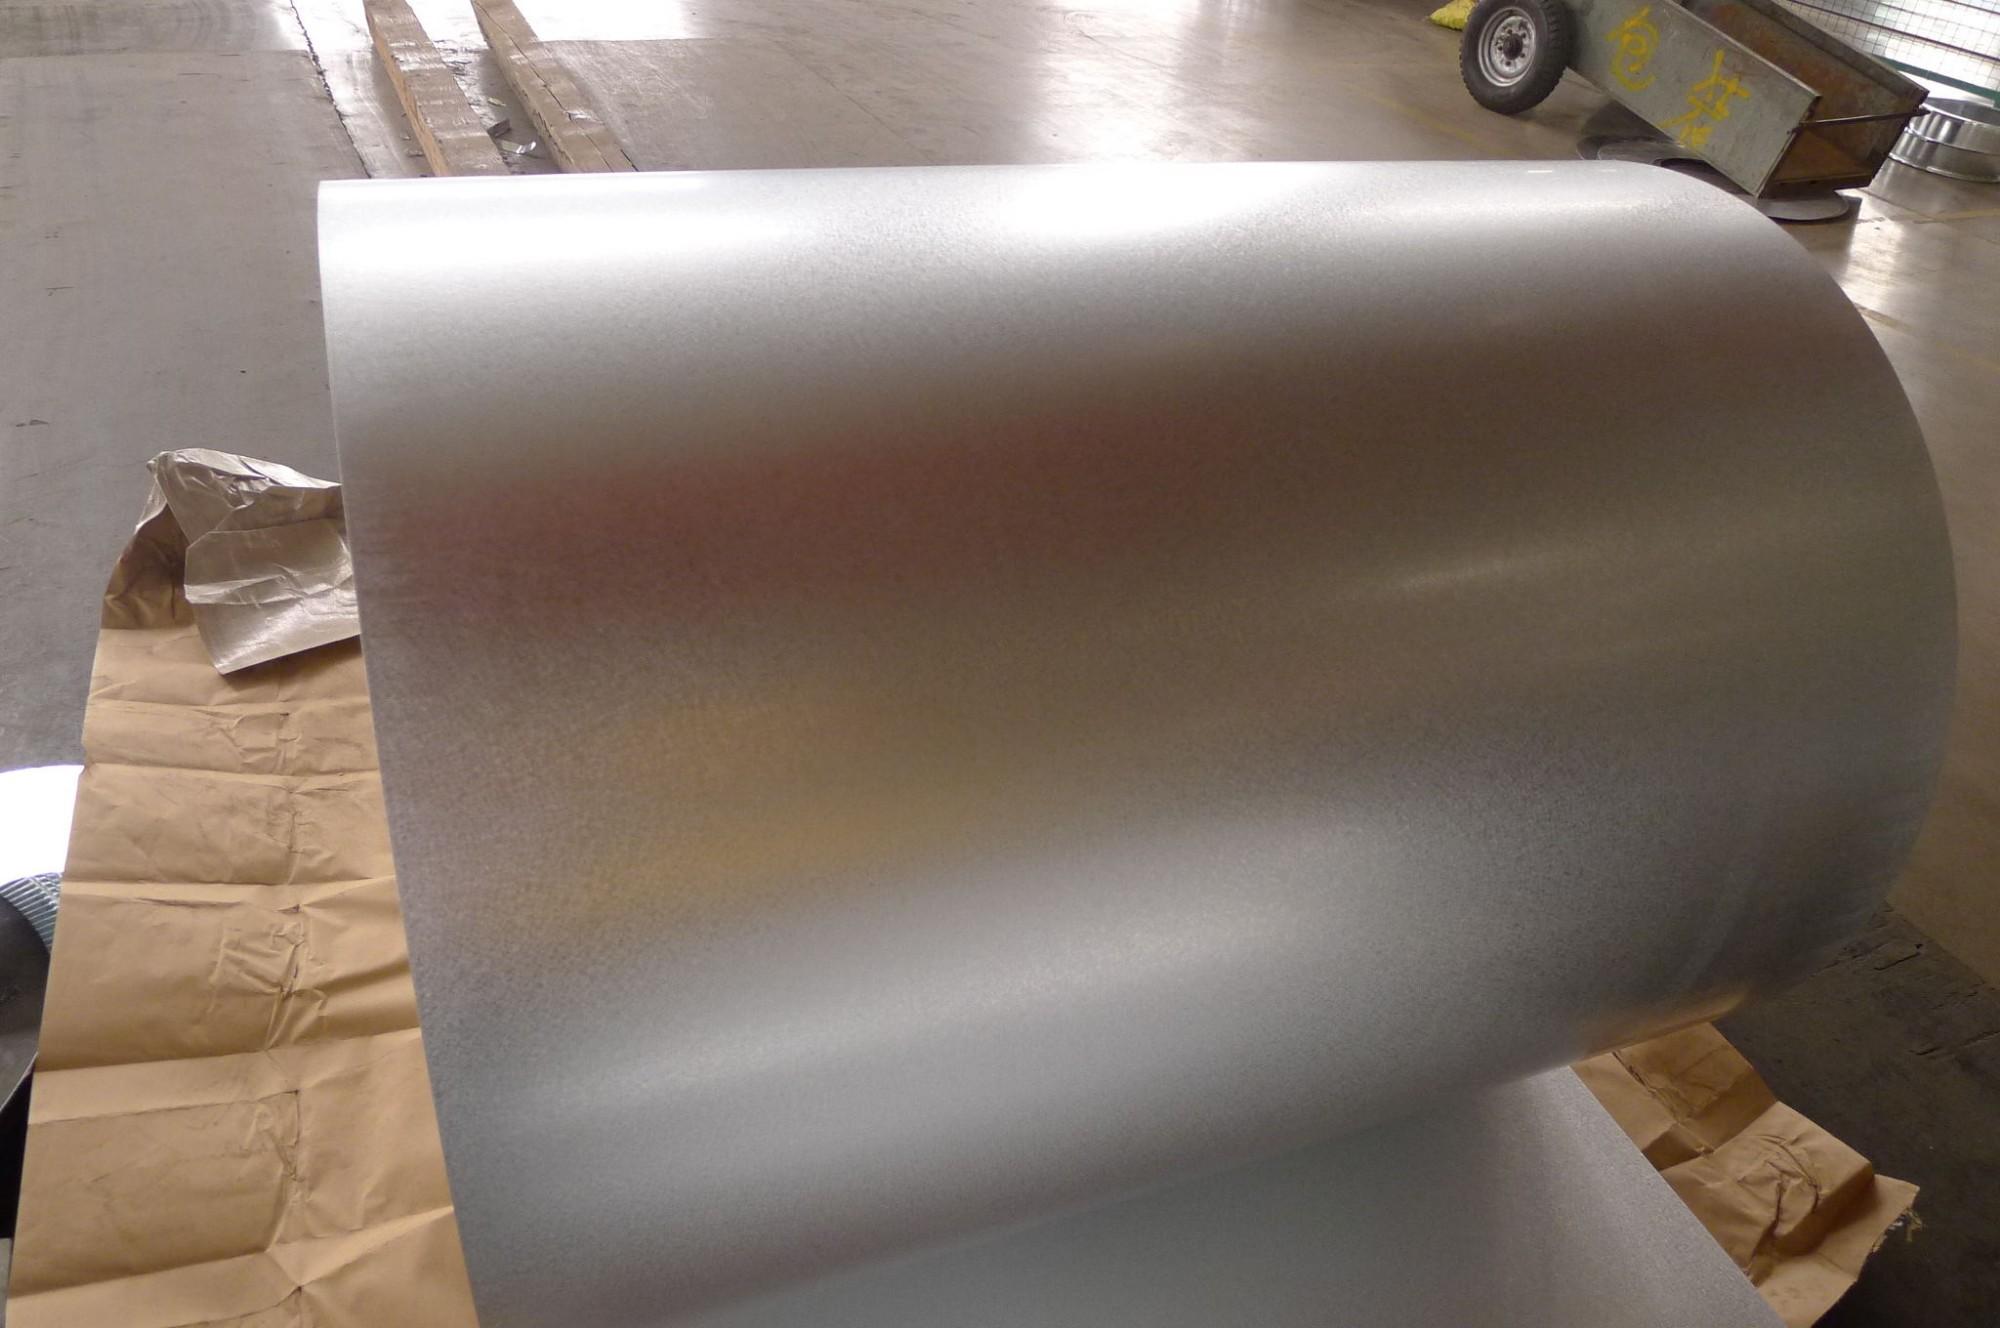 Hot Dip Aluminum Zinc Coils Manufacturers, Hot Dip Aluminum Zinc Coils Factory, Supply Hot Dip Aluminum Zinc Coils